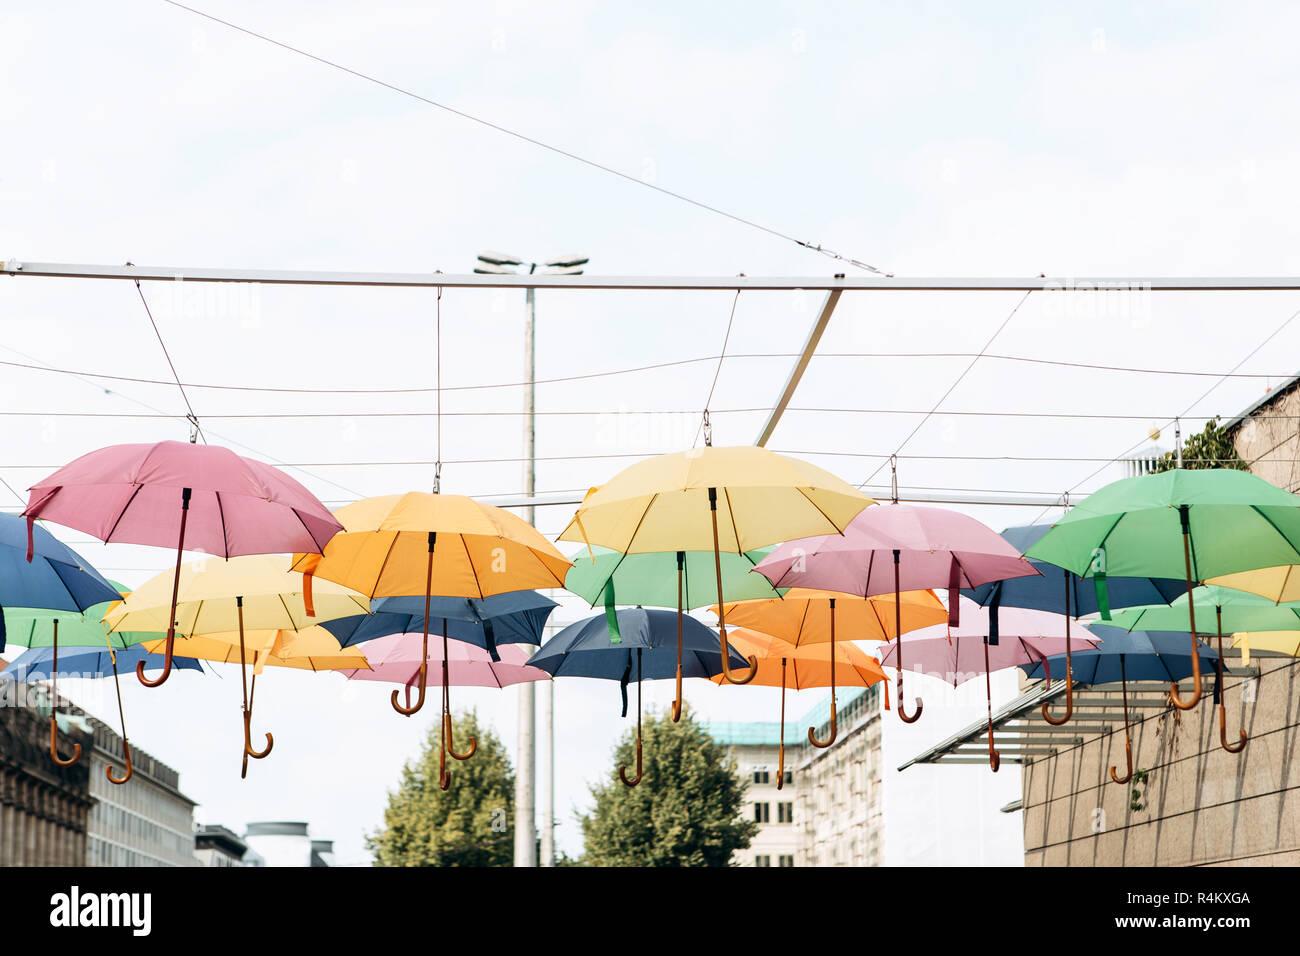 Lots of colorful umbrellas hang overhead. Creative idea. - Stock Image